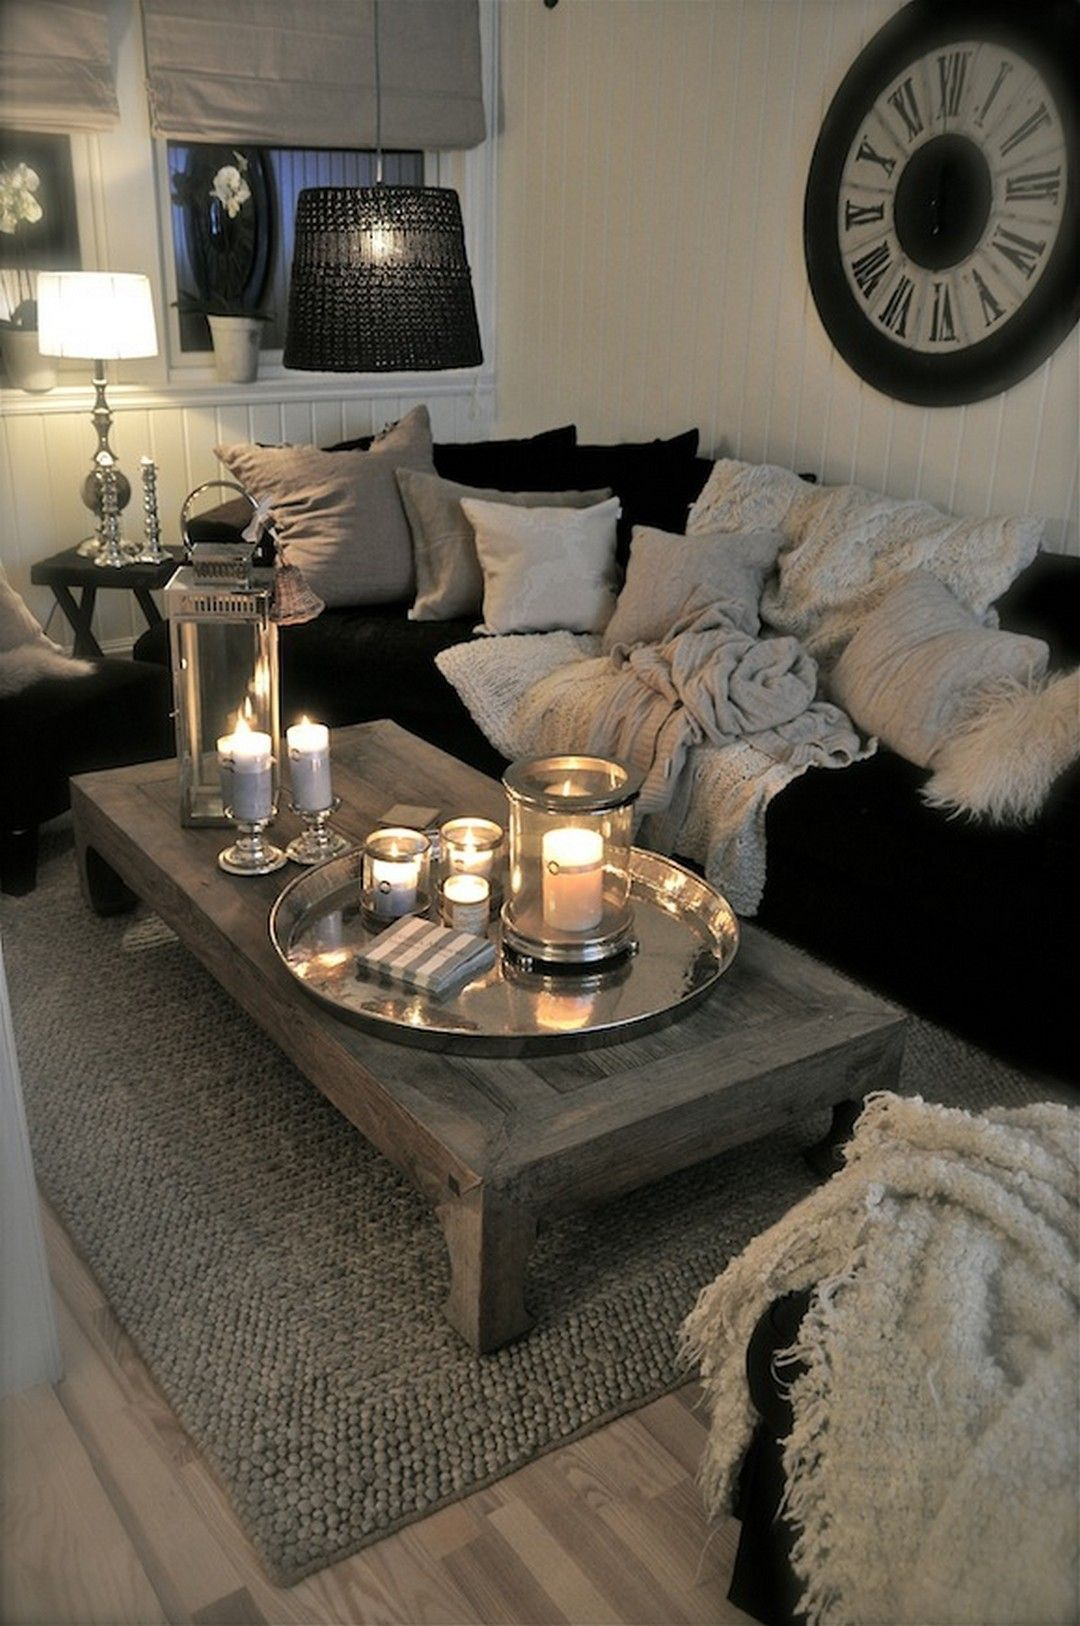 55 Pinterest Home Decor Living Room 2020 Living Room Decor Apartment Apartment Decorating Living College Apartment Decor